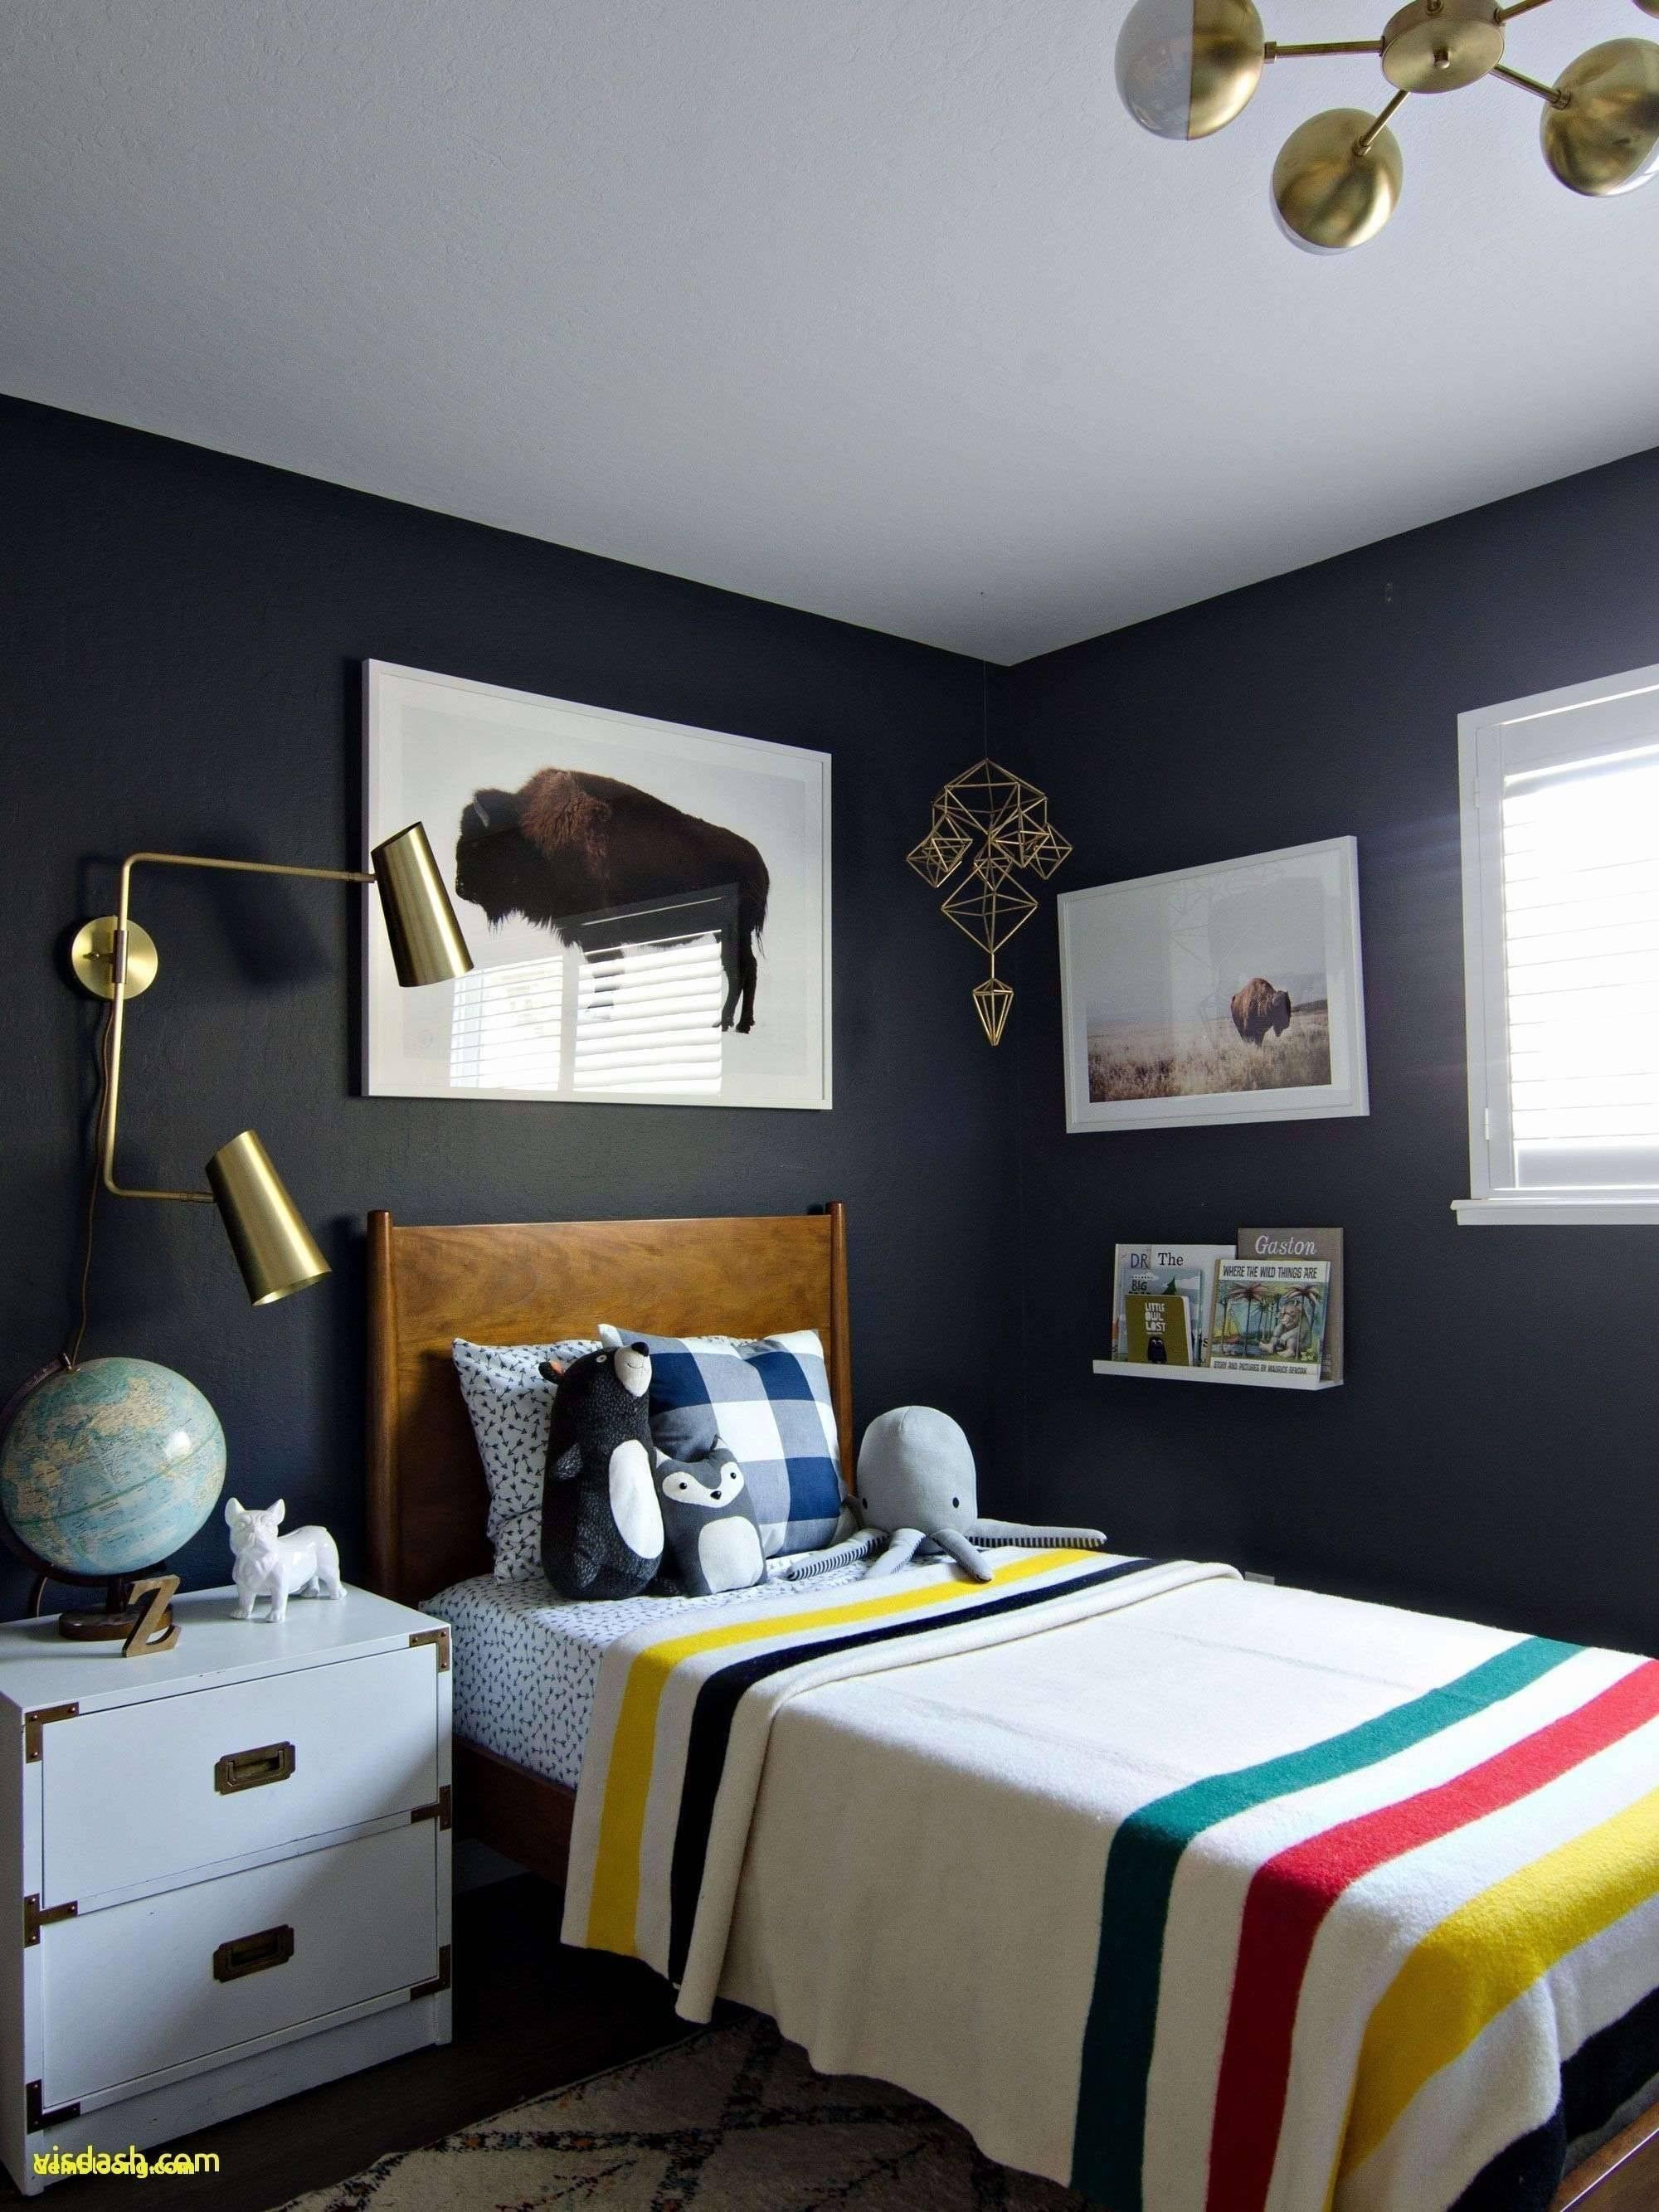 10x10 bedroom ideas luxury unique yellow bedroom ideas home design and interior design of 10x10 bedroom ideas